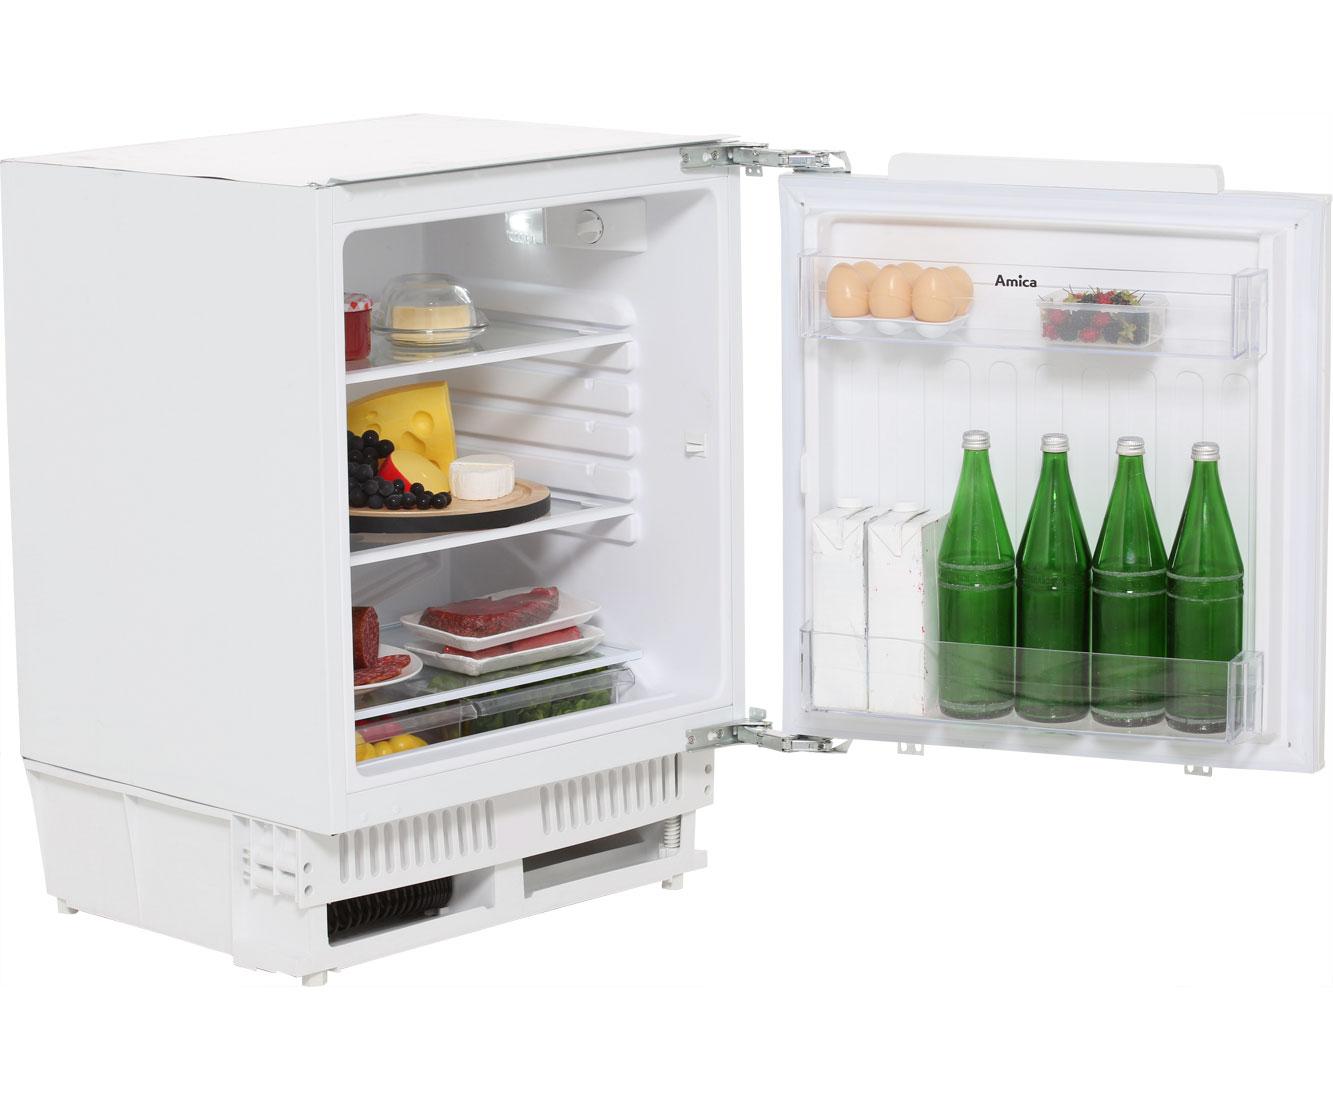 Amica UVKS16149 Kühlschränke - Weiß